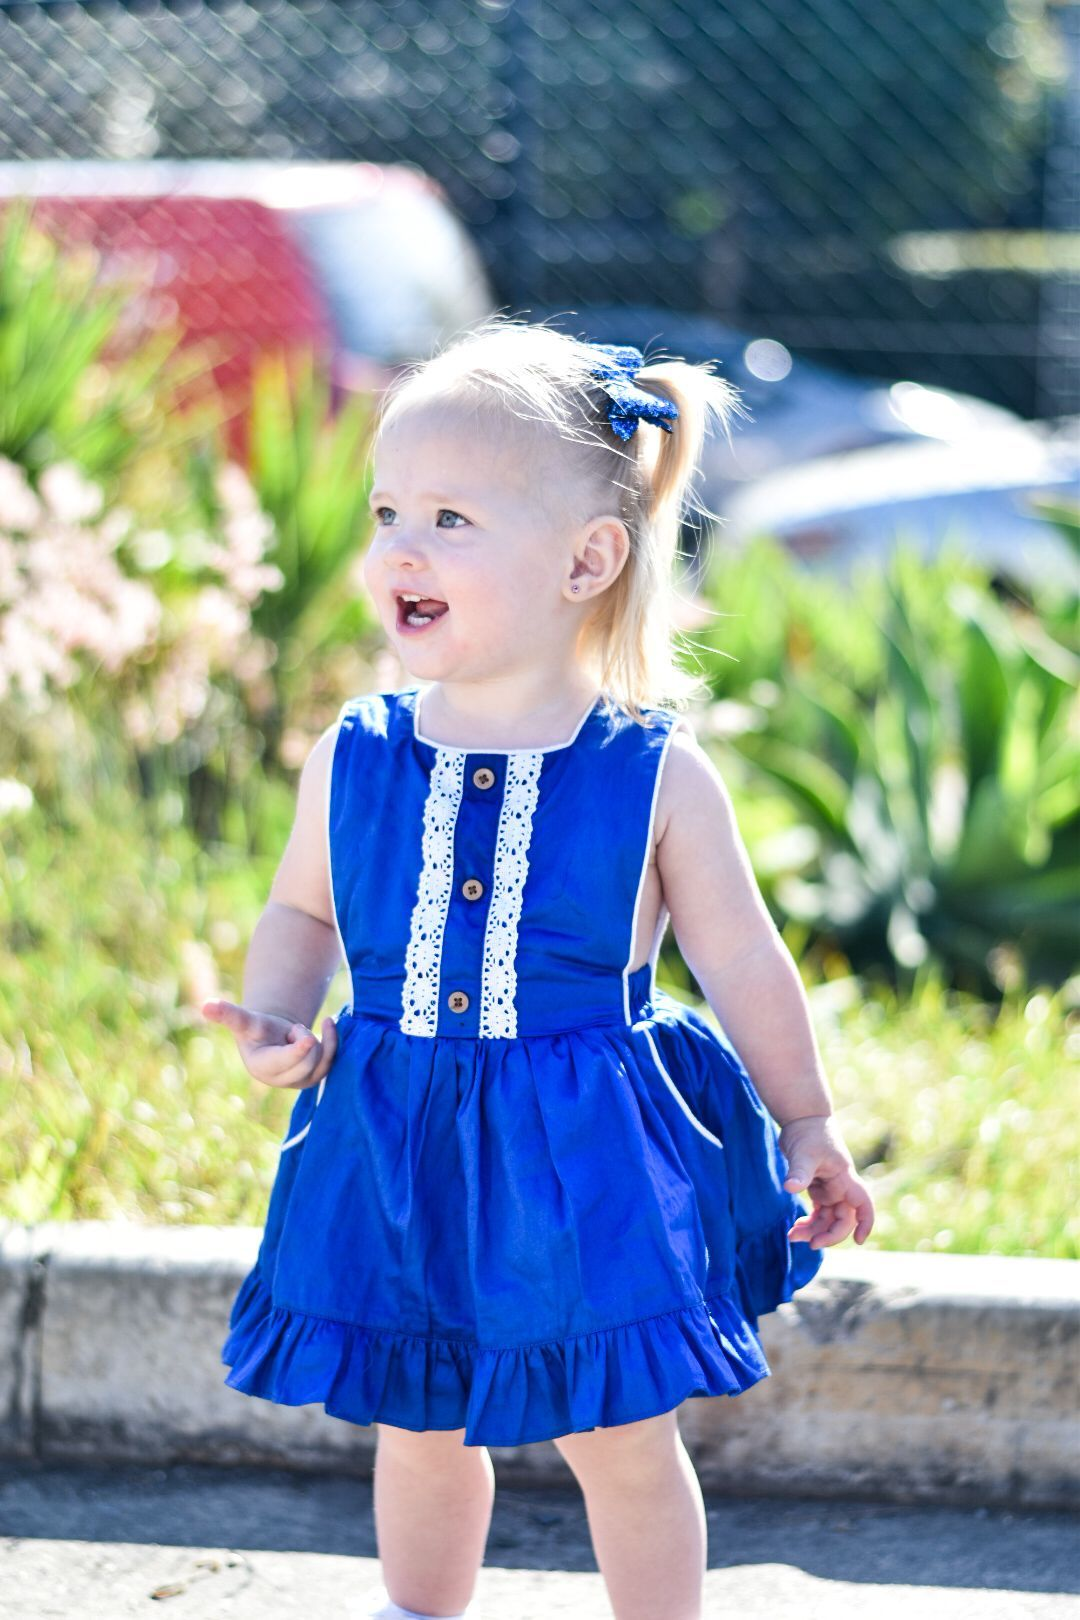 Cute girl in blue dress